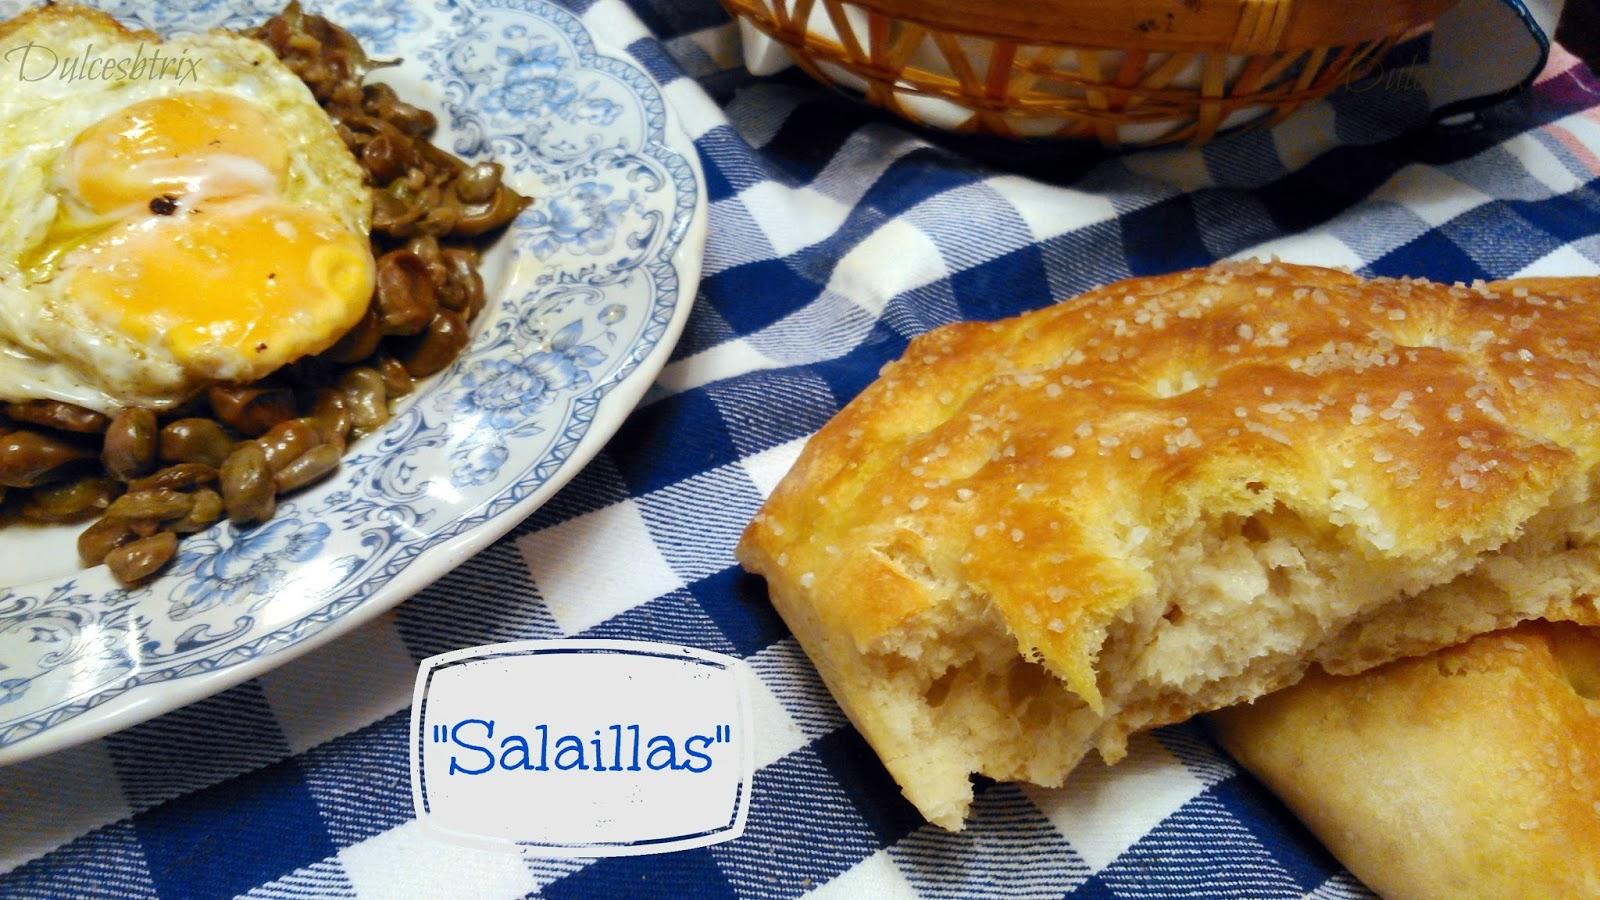 Salaillas-Dulcesbtrix